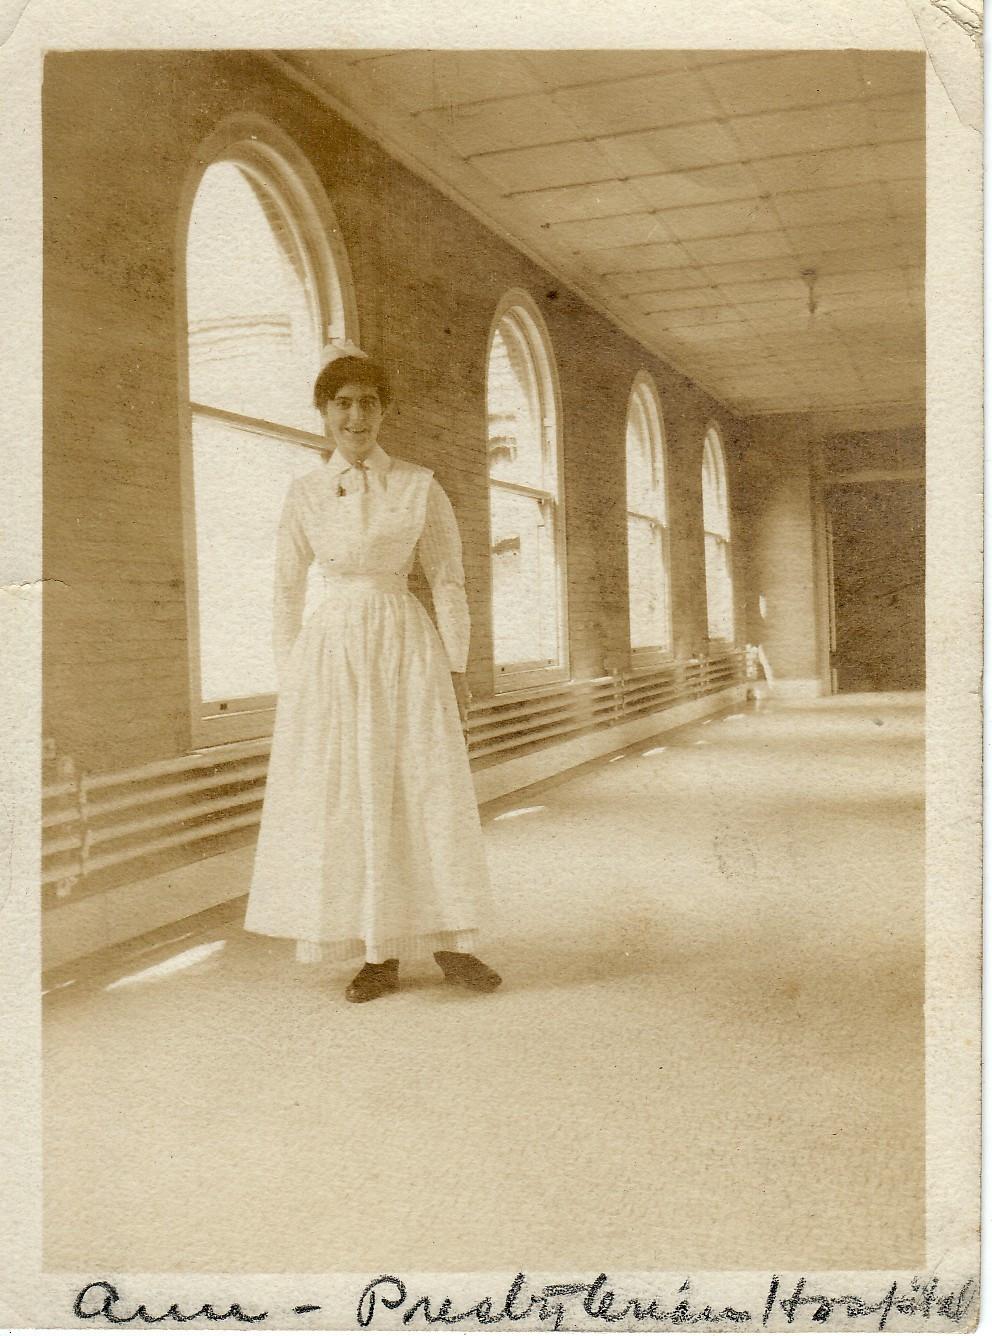 Anna Fredericka Bauer